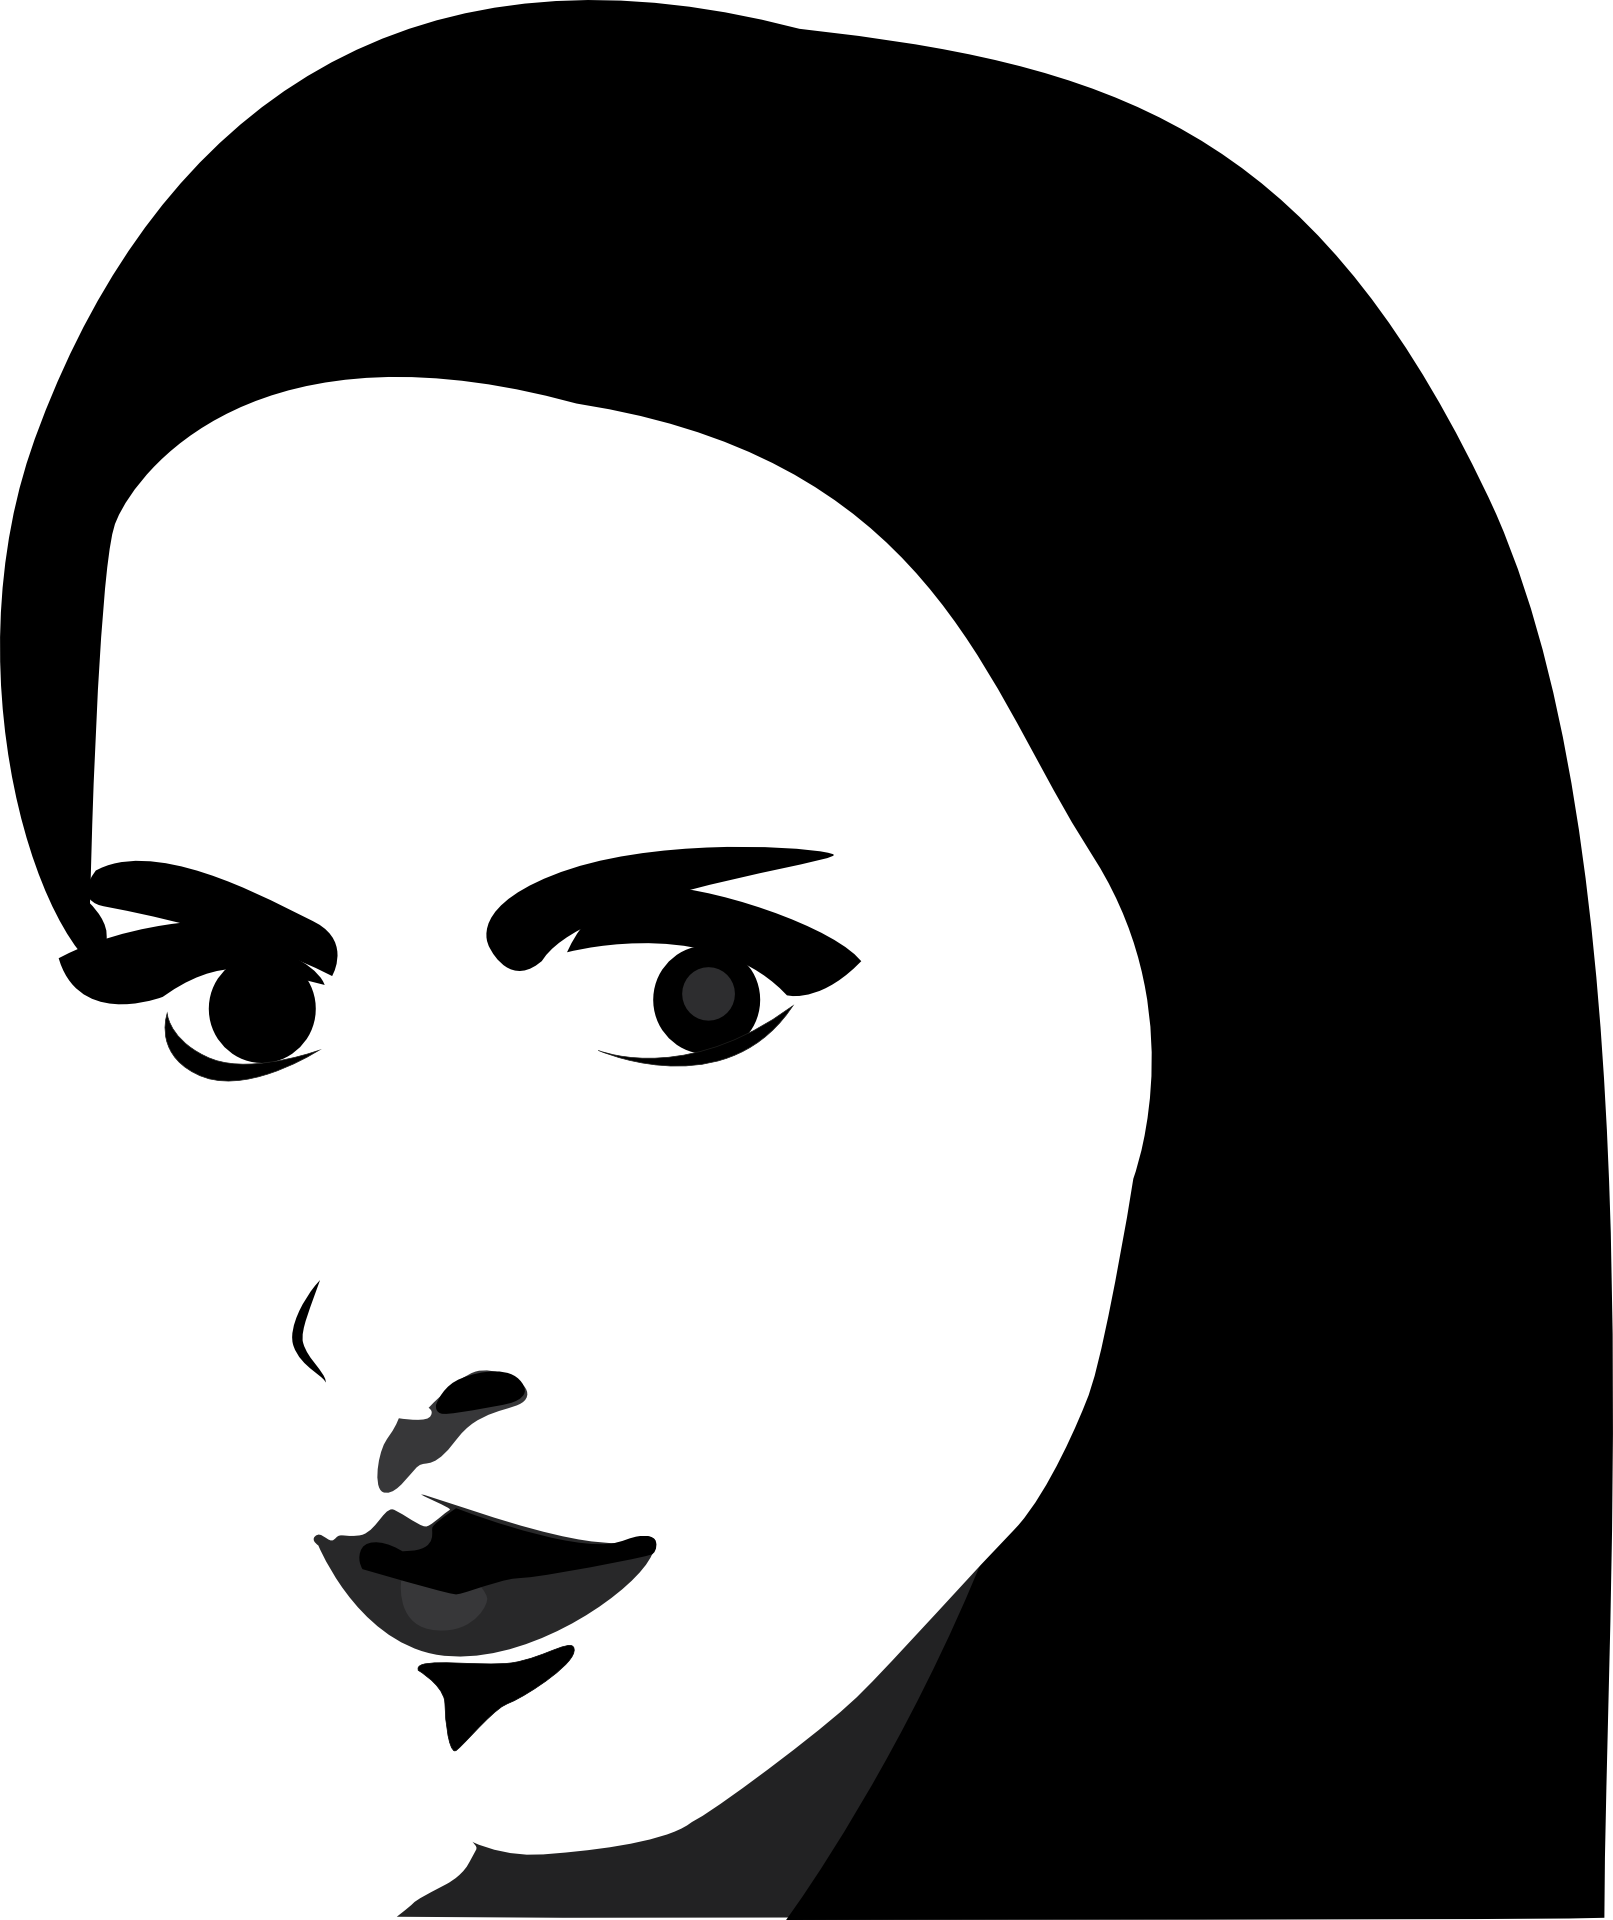 jpg black and white stock Face eye contact art. Bananna clip black hair